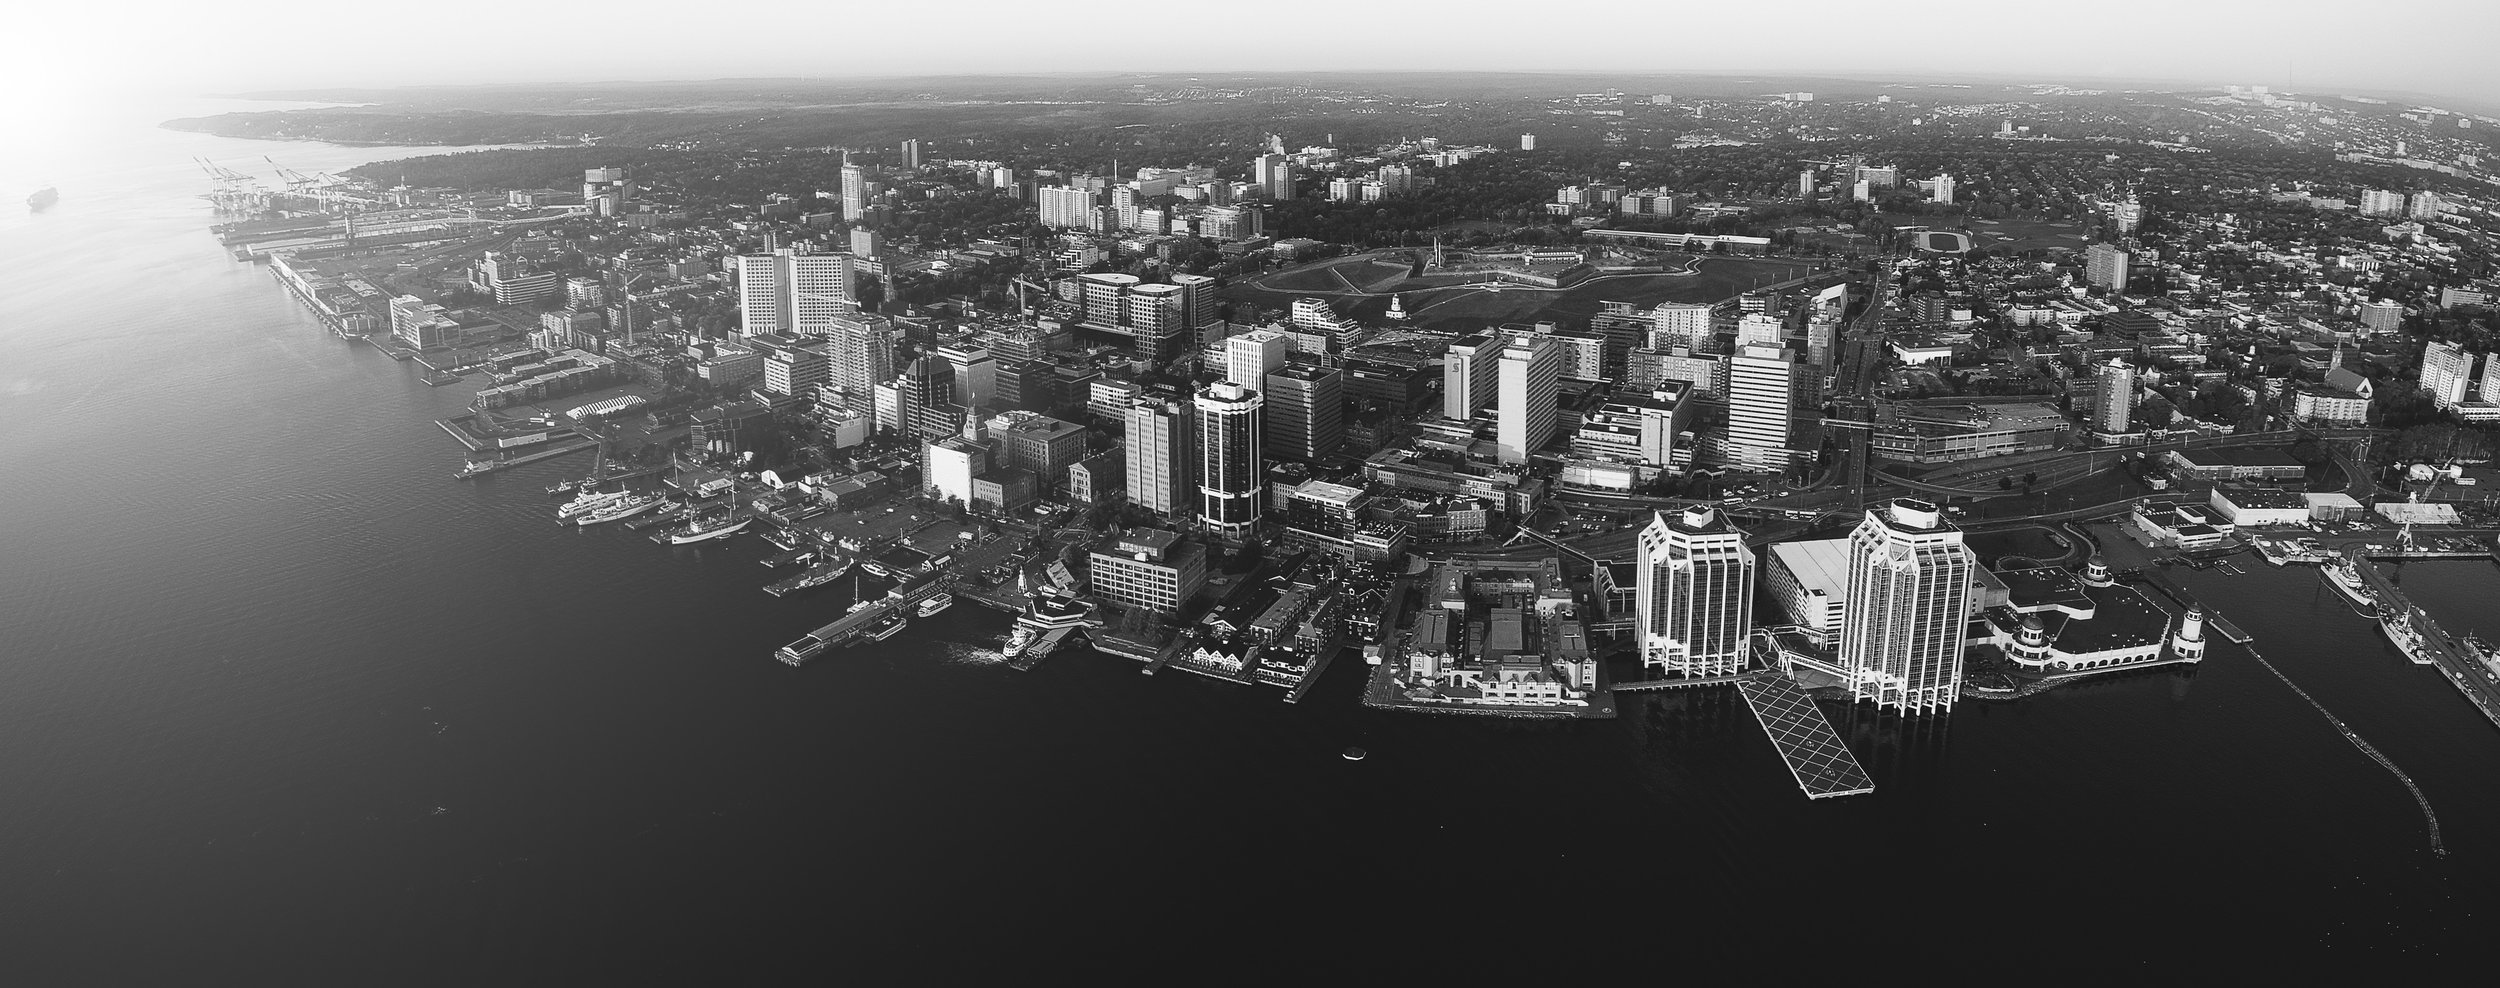 Halifax Drone panorama Brinton Photo.jpg